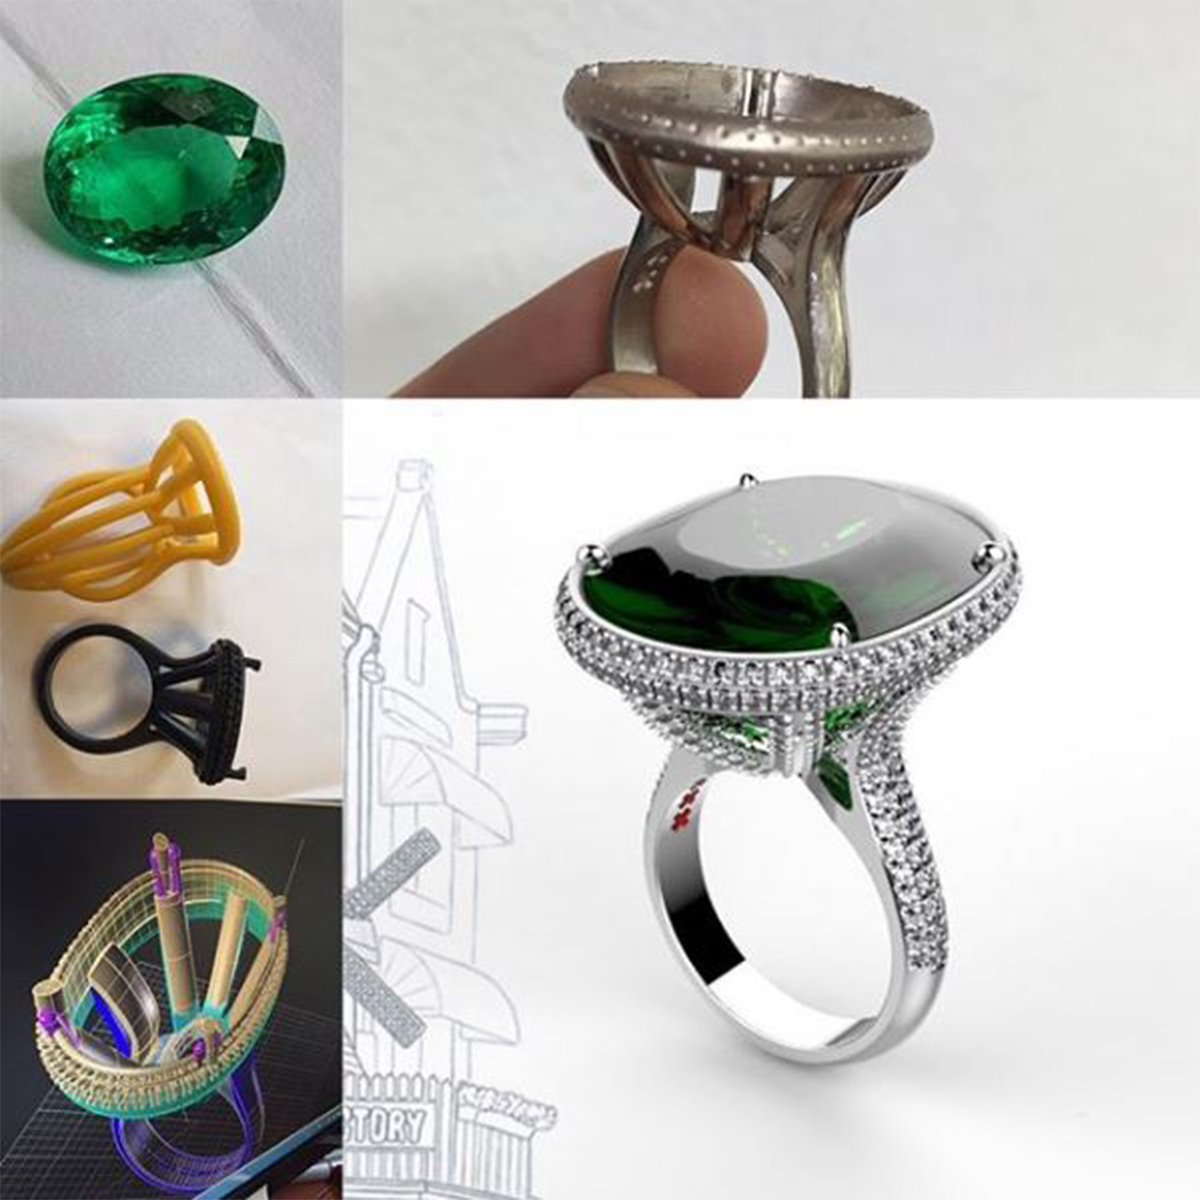 https://milldiamonds.com/wp-content/uploads/2020/05/1200x1200px-3d-ontwerp-sfeerfoto-2.jpg